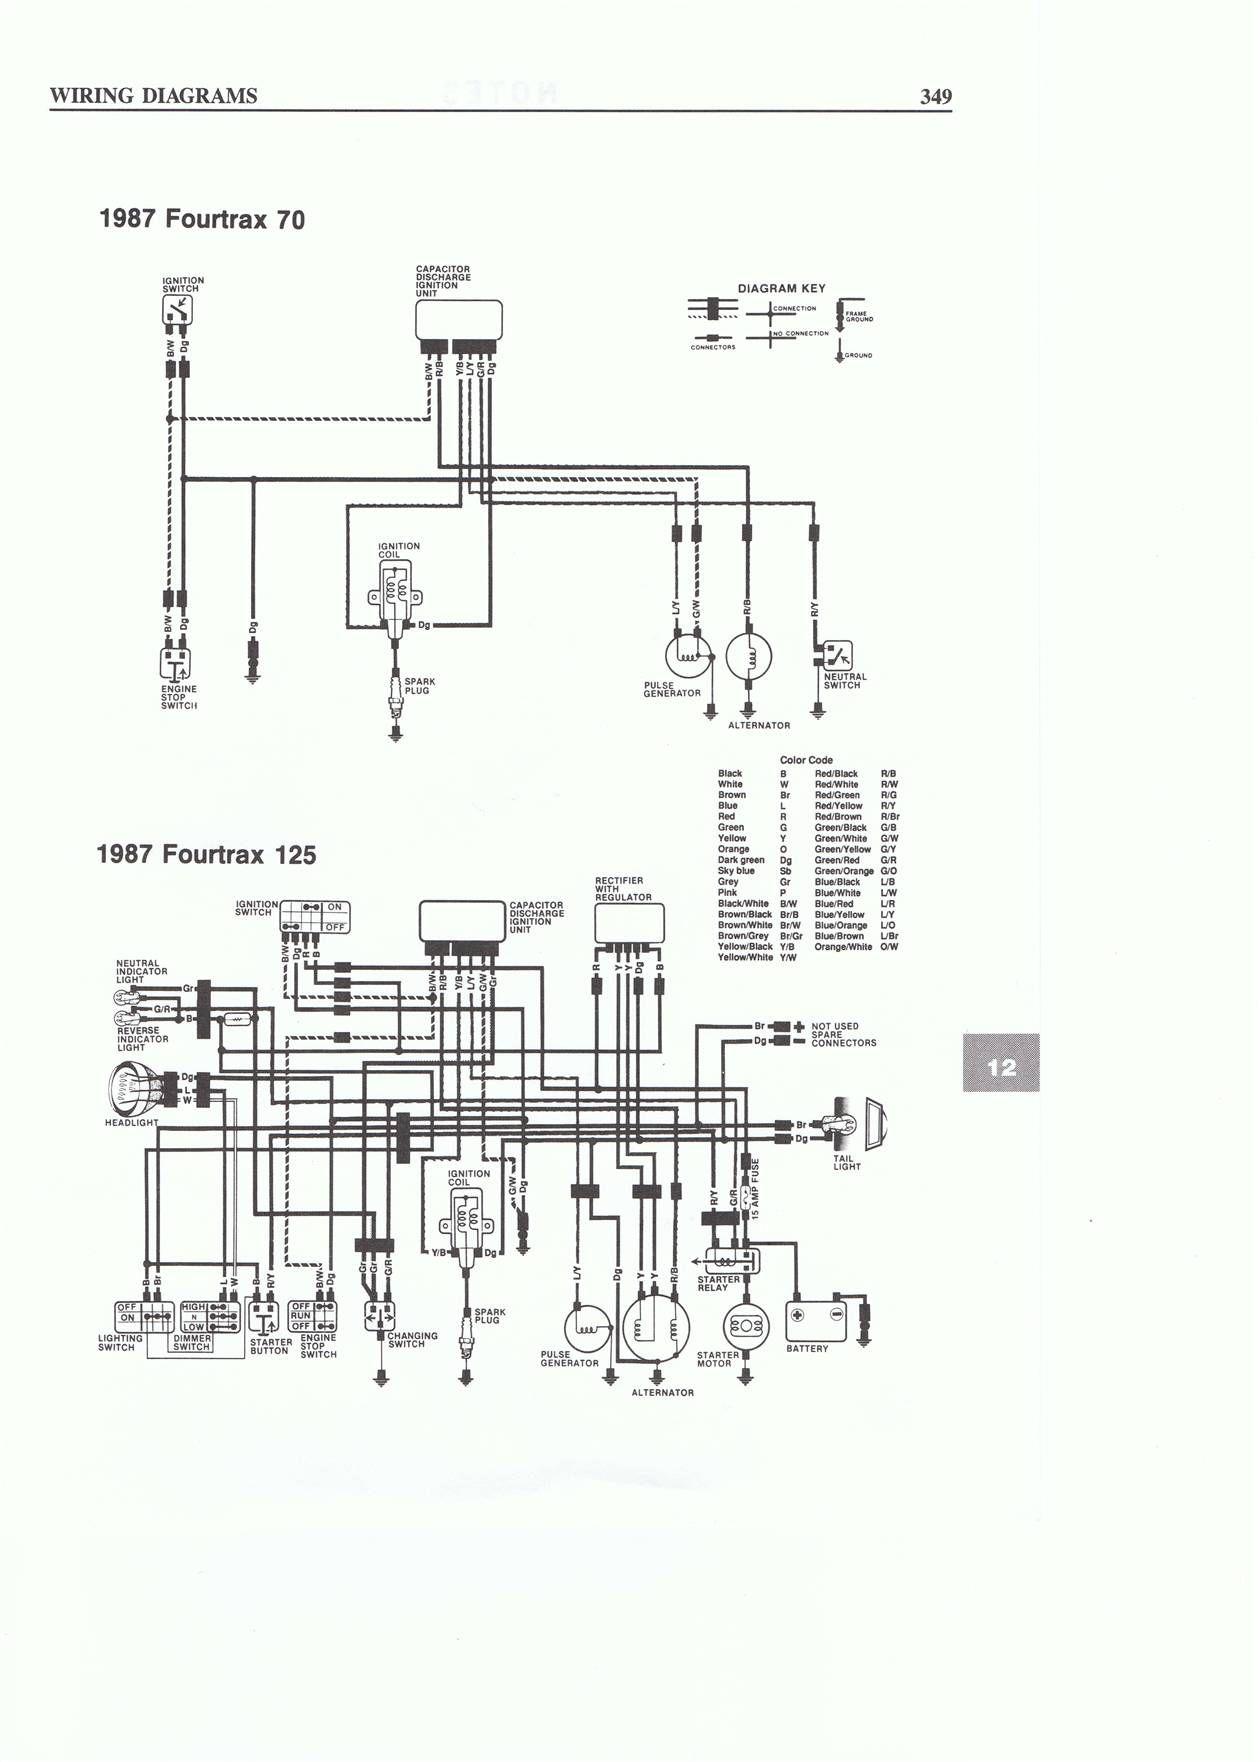 hight resolution of craftsman gt5000 wiring diagram wiring diagram specialtiescraftsman gt5000 wiring diagram best wiring librarycraftsman gt5000 wiring diagram